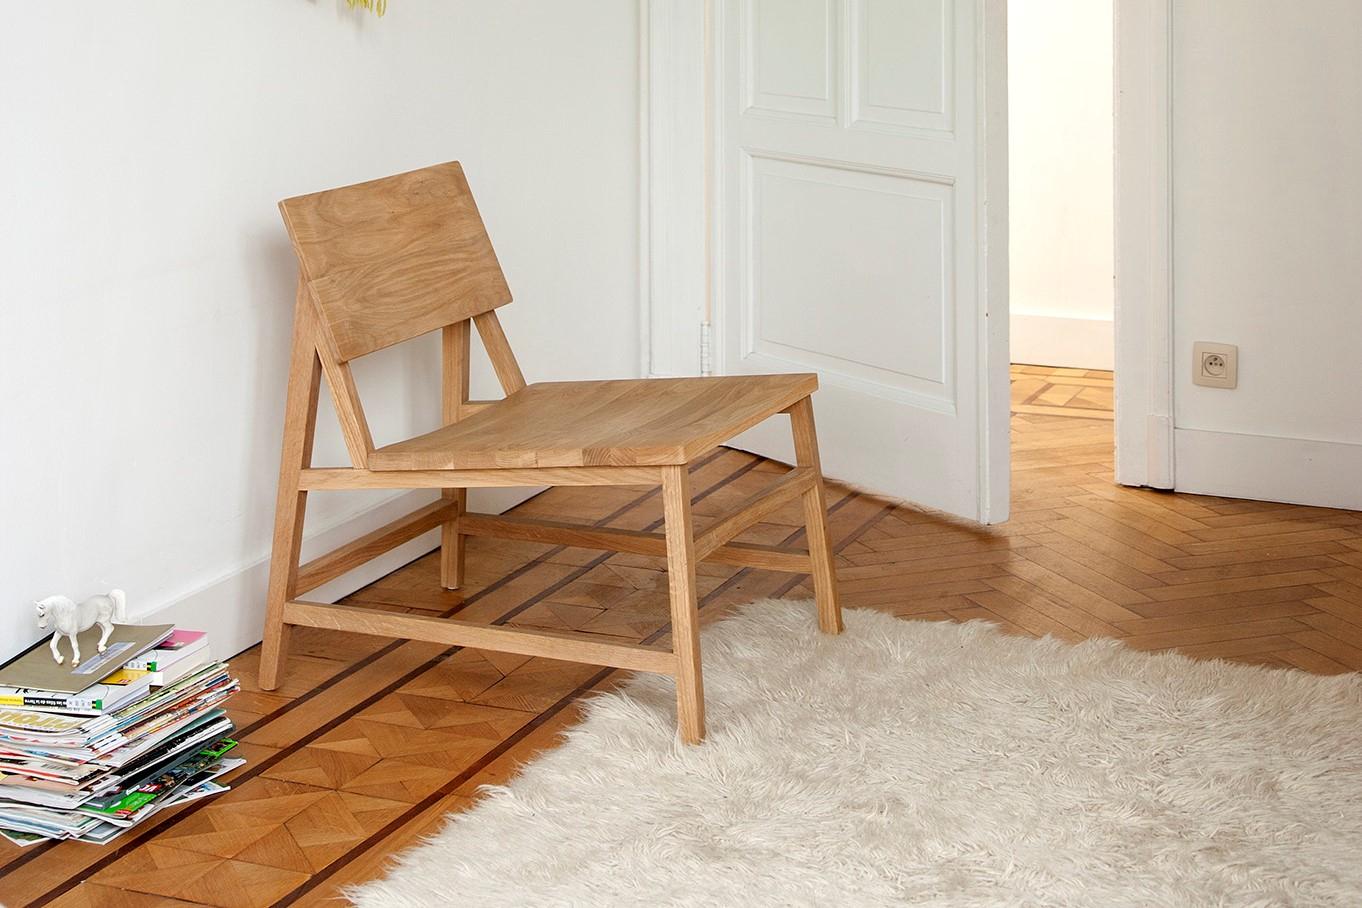 Chaise Lounge N2 en chêne - ETHNICRAFT